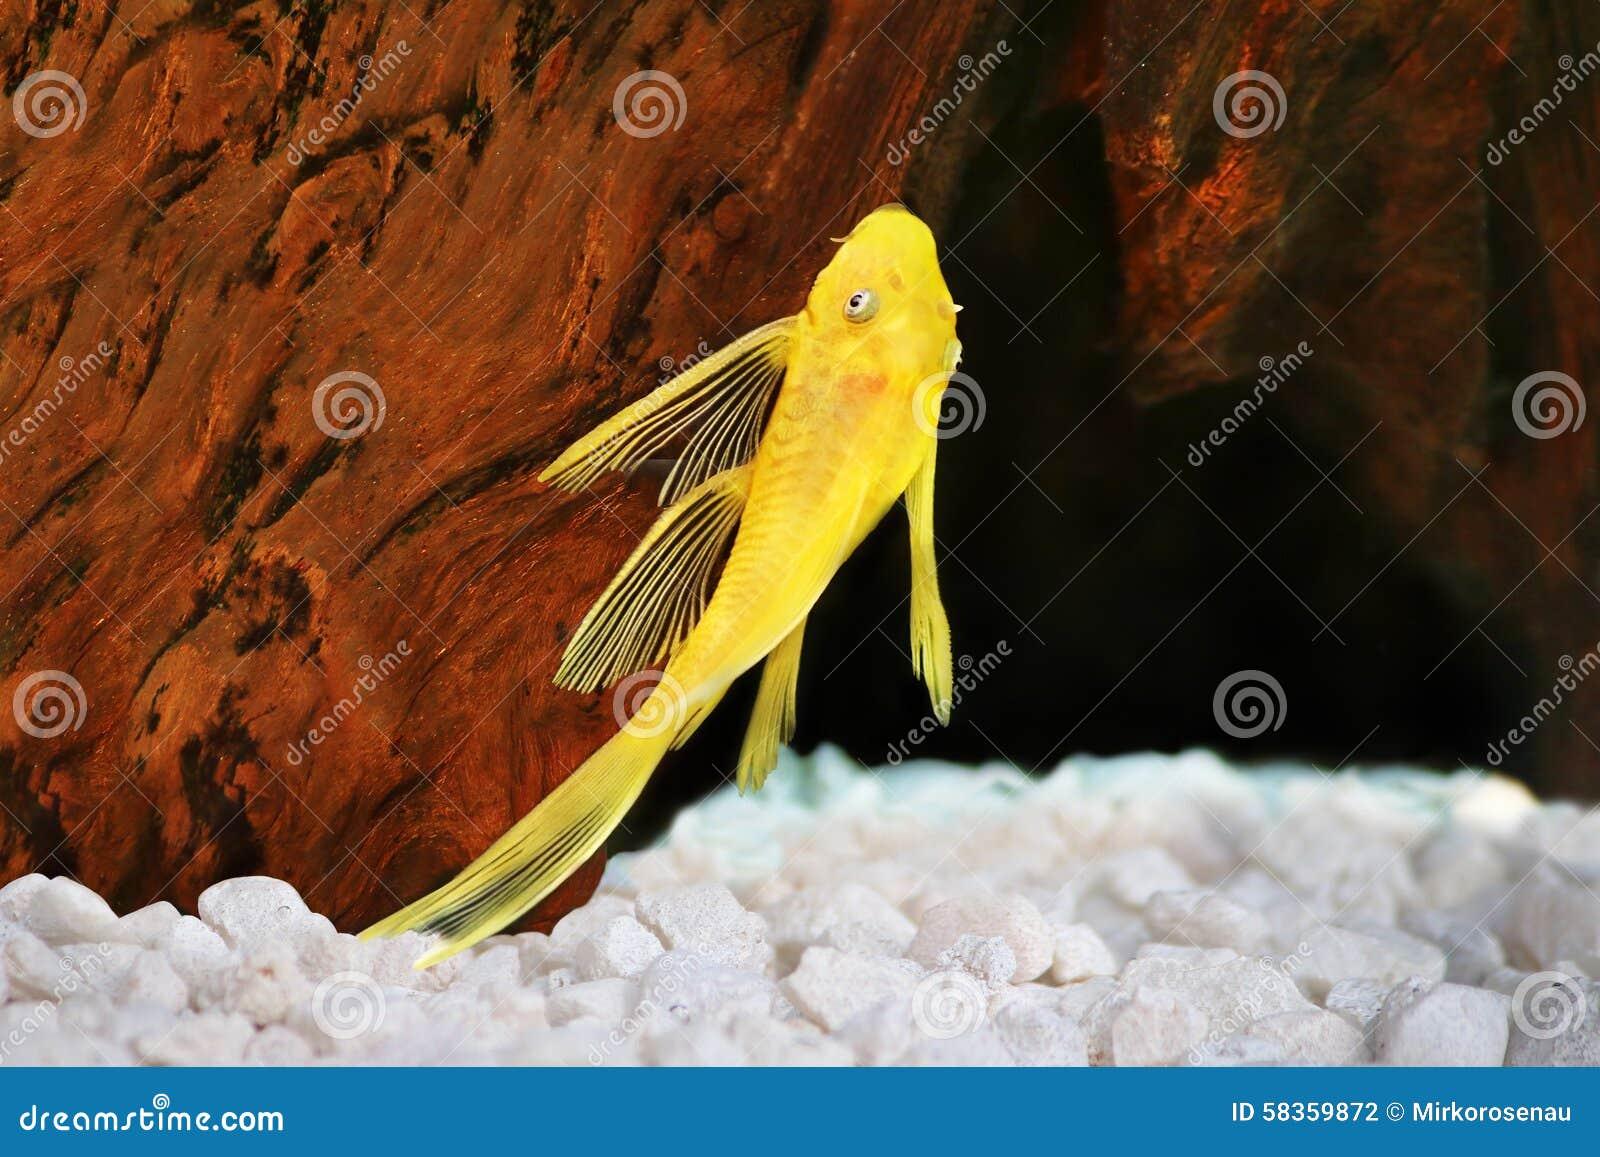 Poissons d 39 aquarium de plecostomus de dolichopterus d for Nettoyeur aquarium poisson